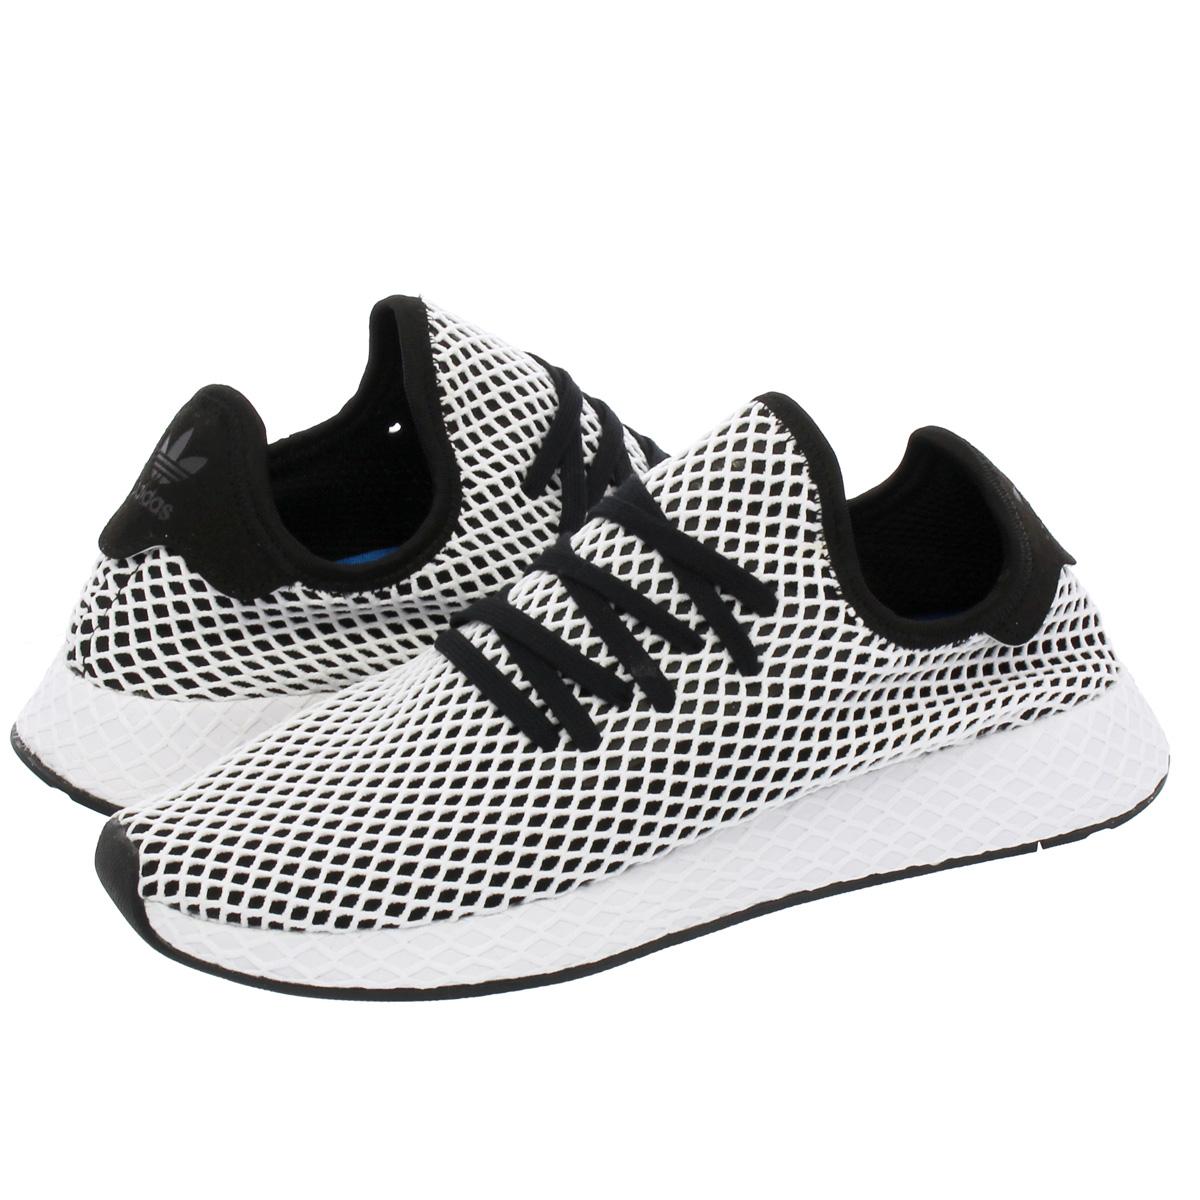 adidas deerupt runner for running